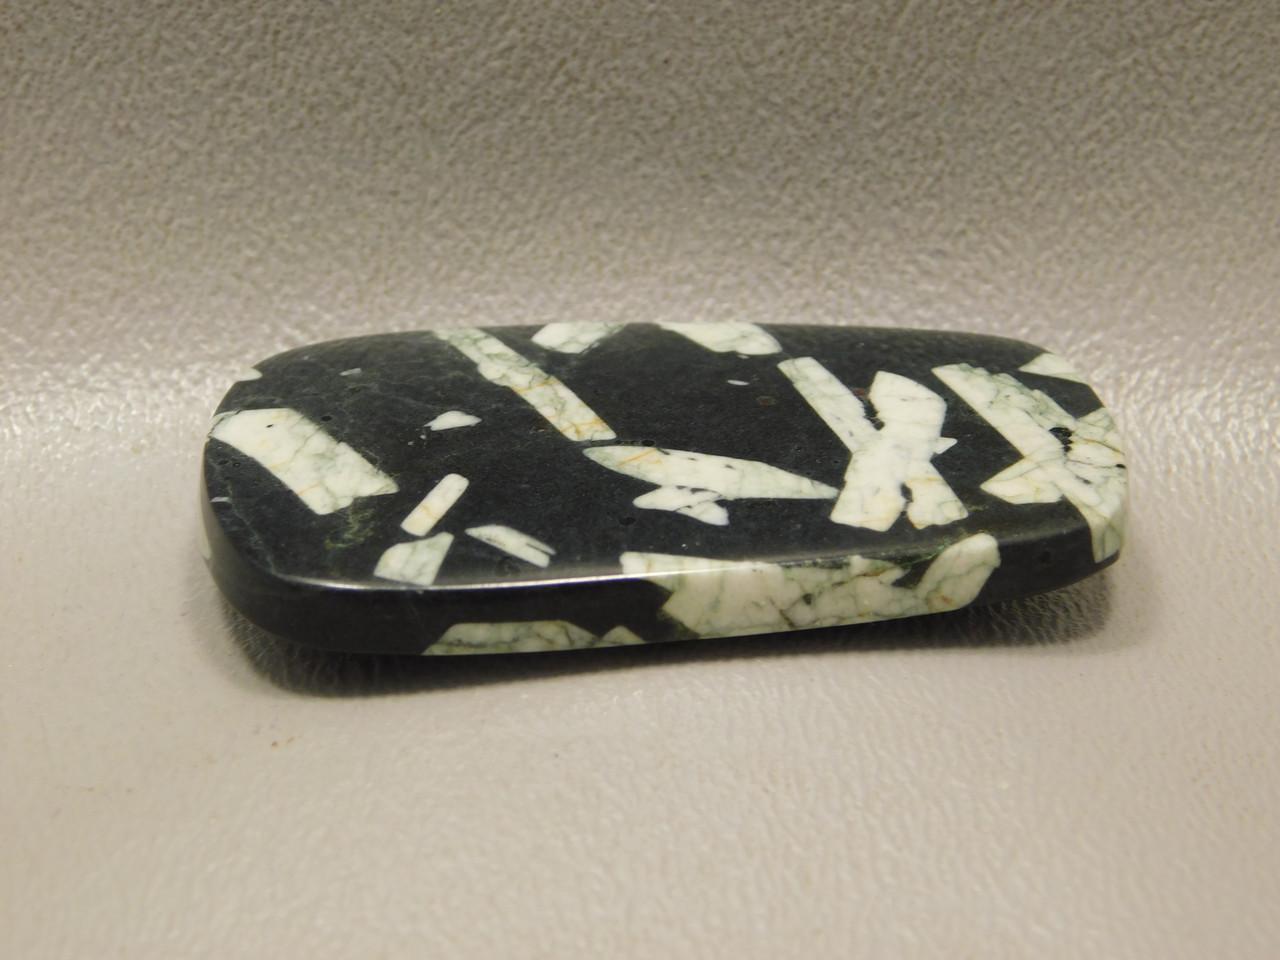 Chinese Writing Rock Cabochon Stone Ladder Shaped Gemstone #1